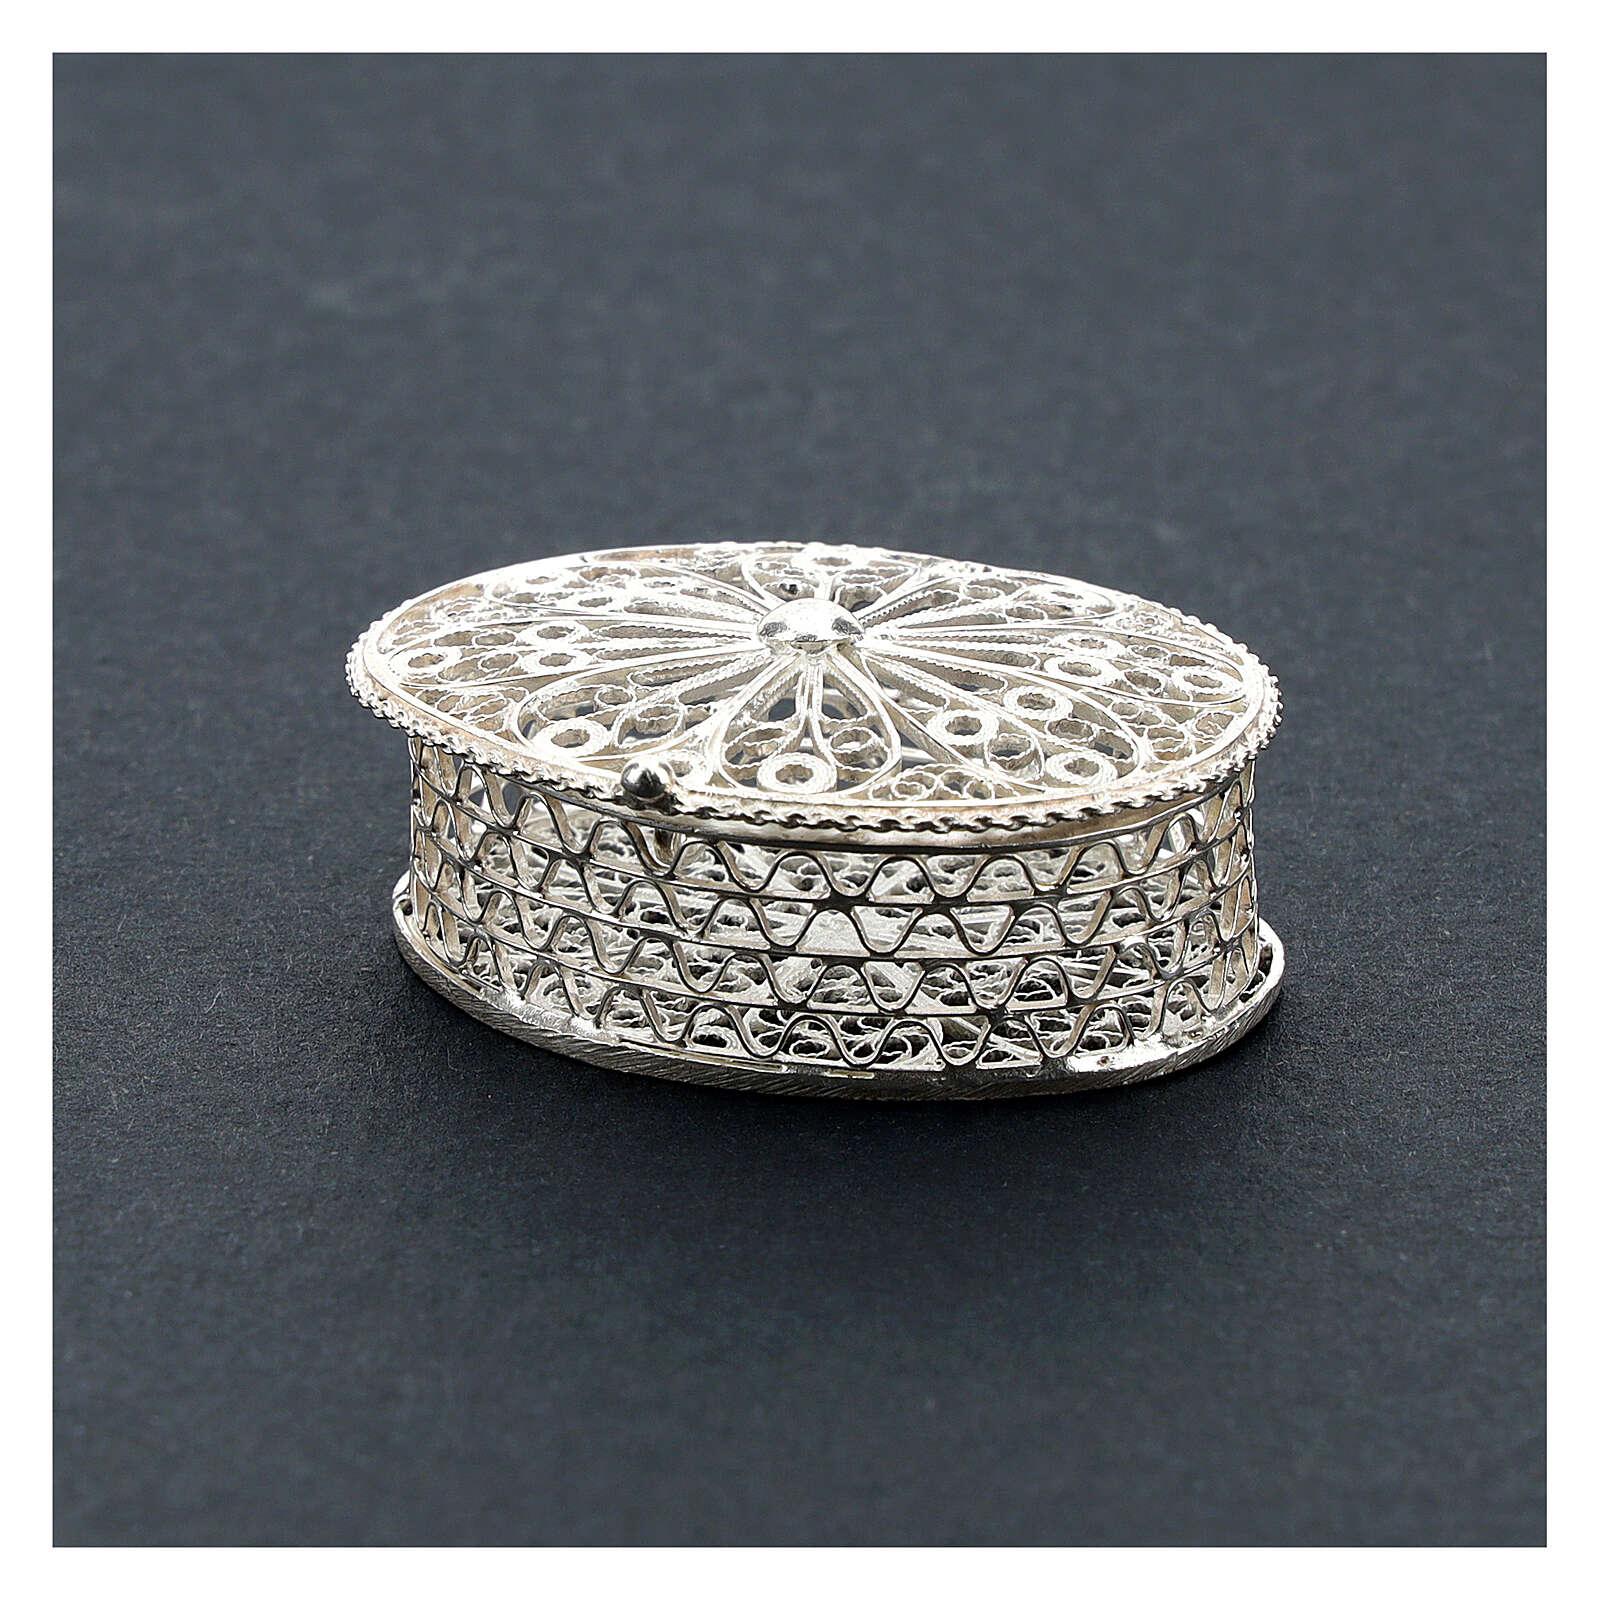 Portarosario ovale in argento 800 con incisioni 4